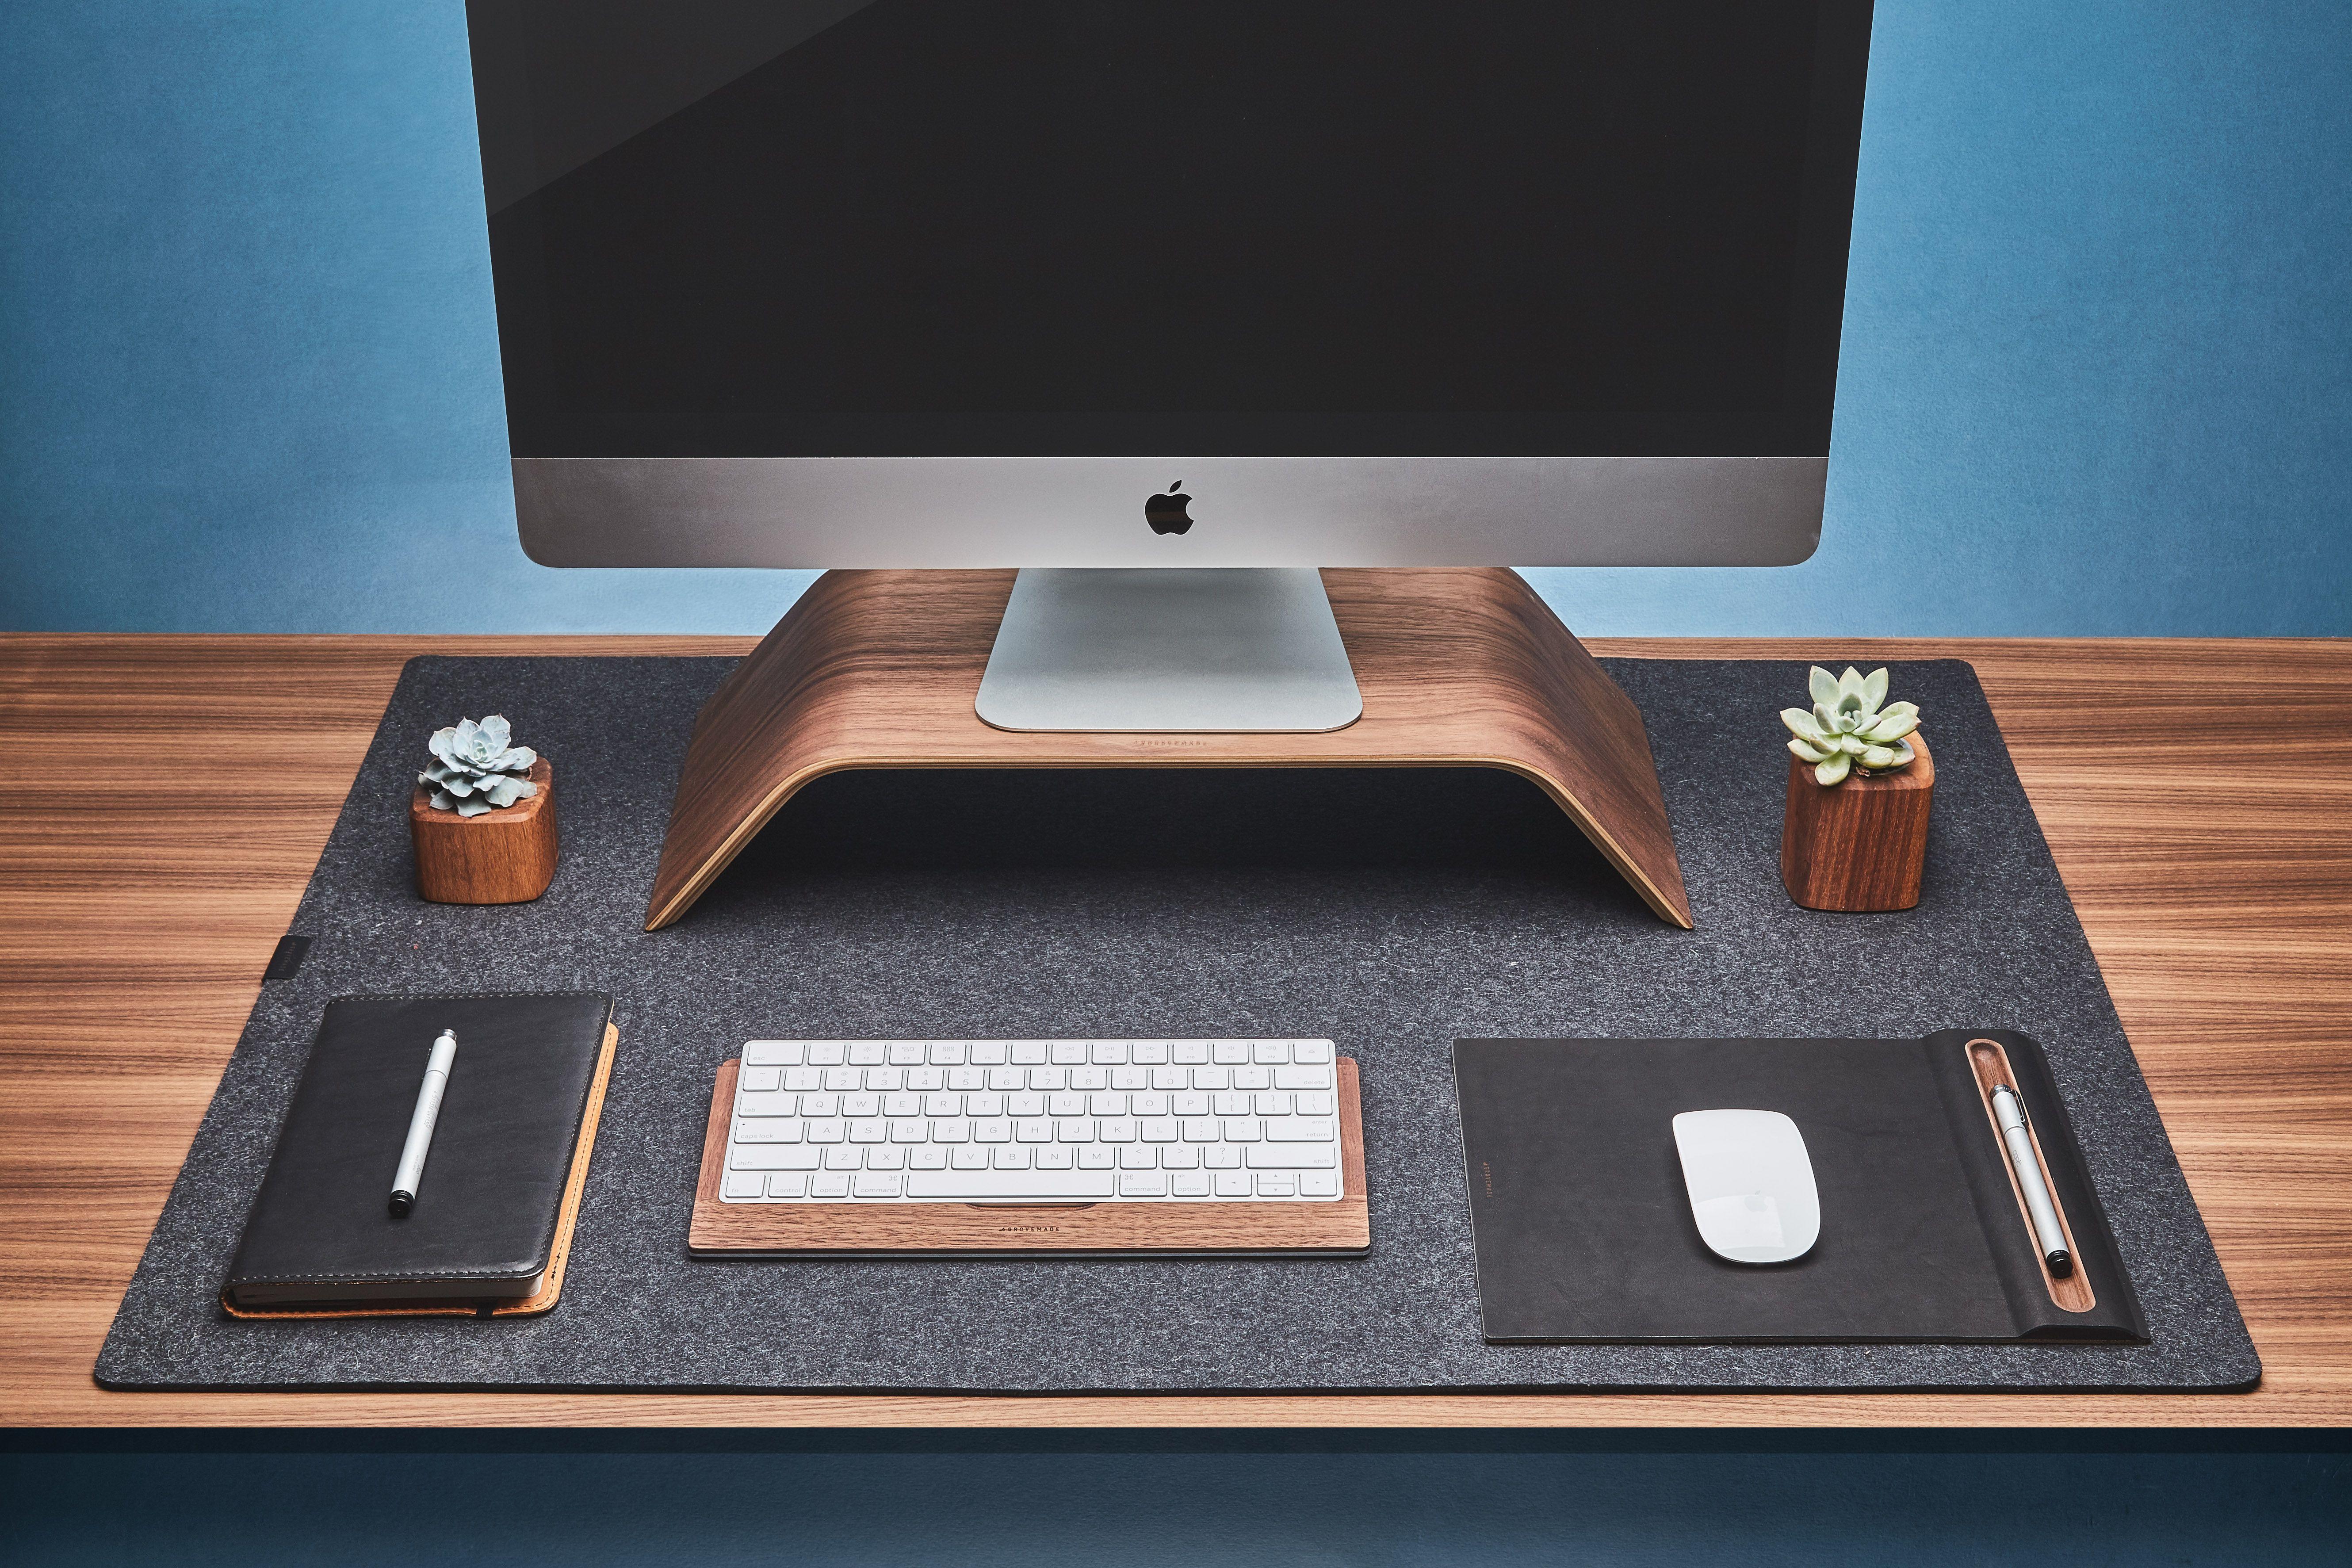 Wool Felt Desk Pad Dark Grey In 2020 Desk Pad Imac Desk Computer Desk Setup